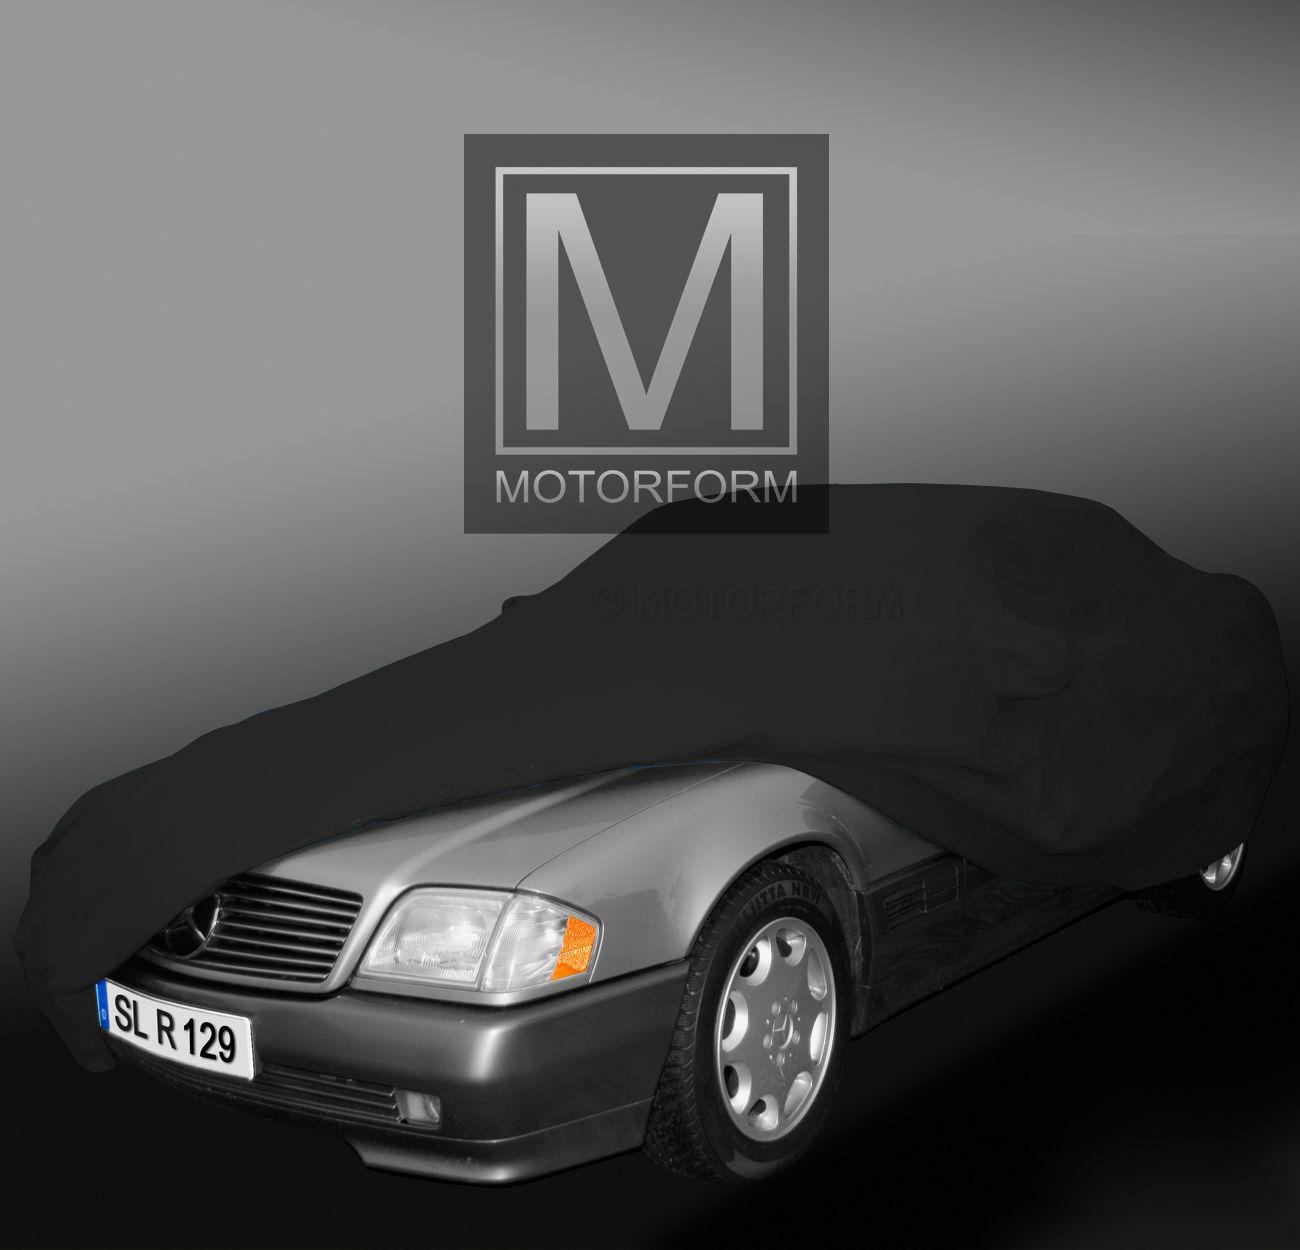 Audi A5 S5 Ganzgarage Car Cover Auto-Garage A 5 S